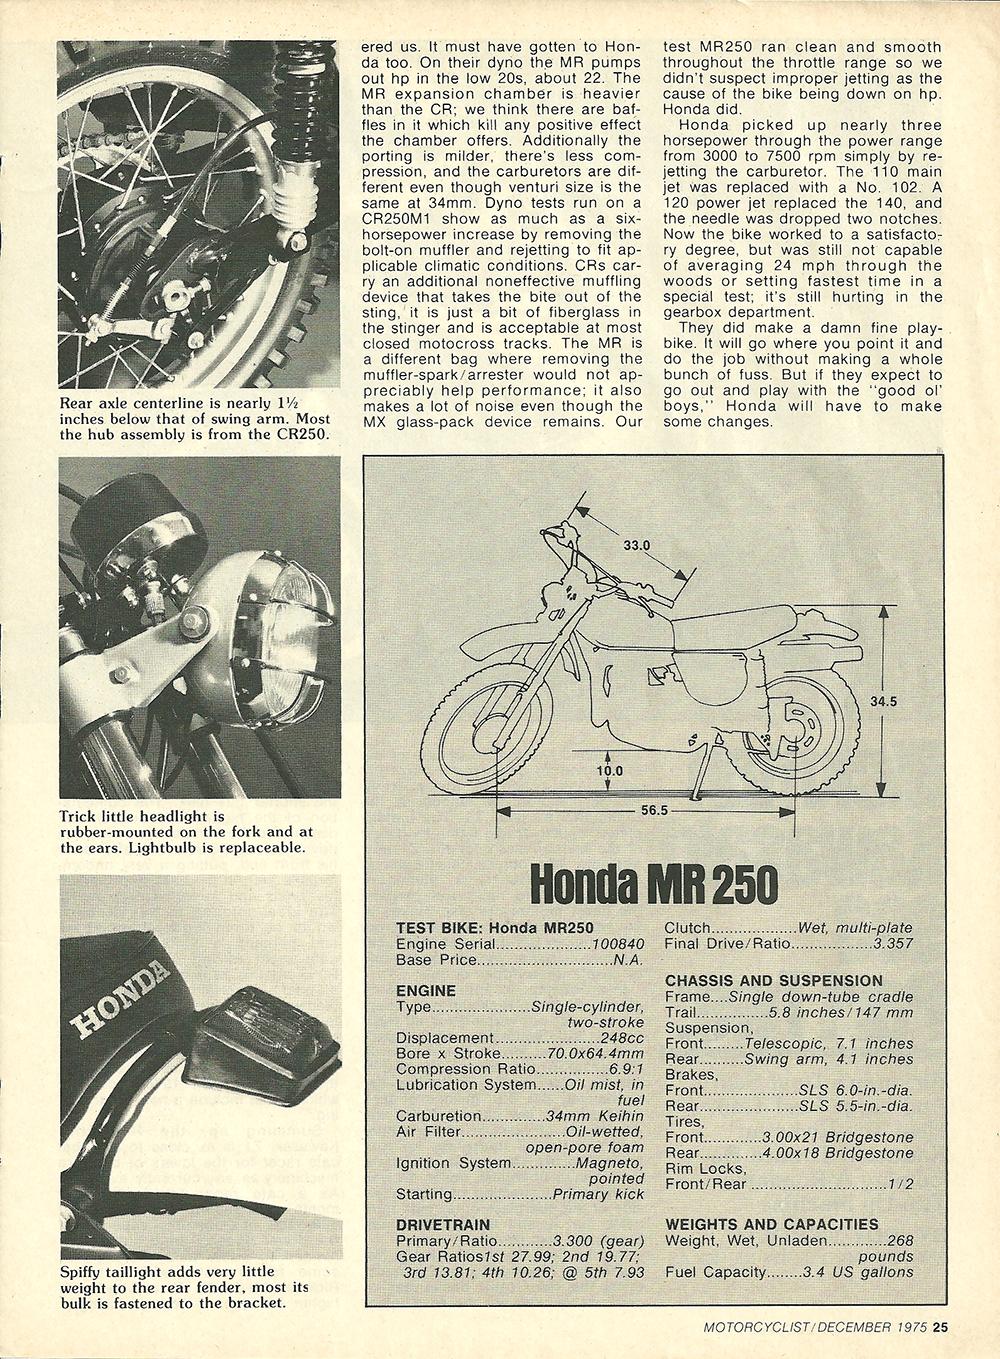 1975 Honda MR 250 road test 4.jpg